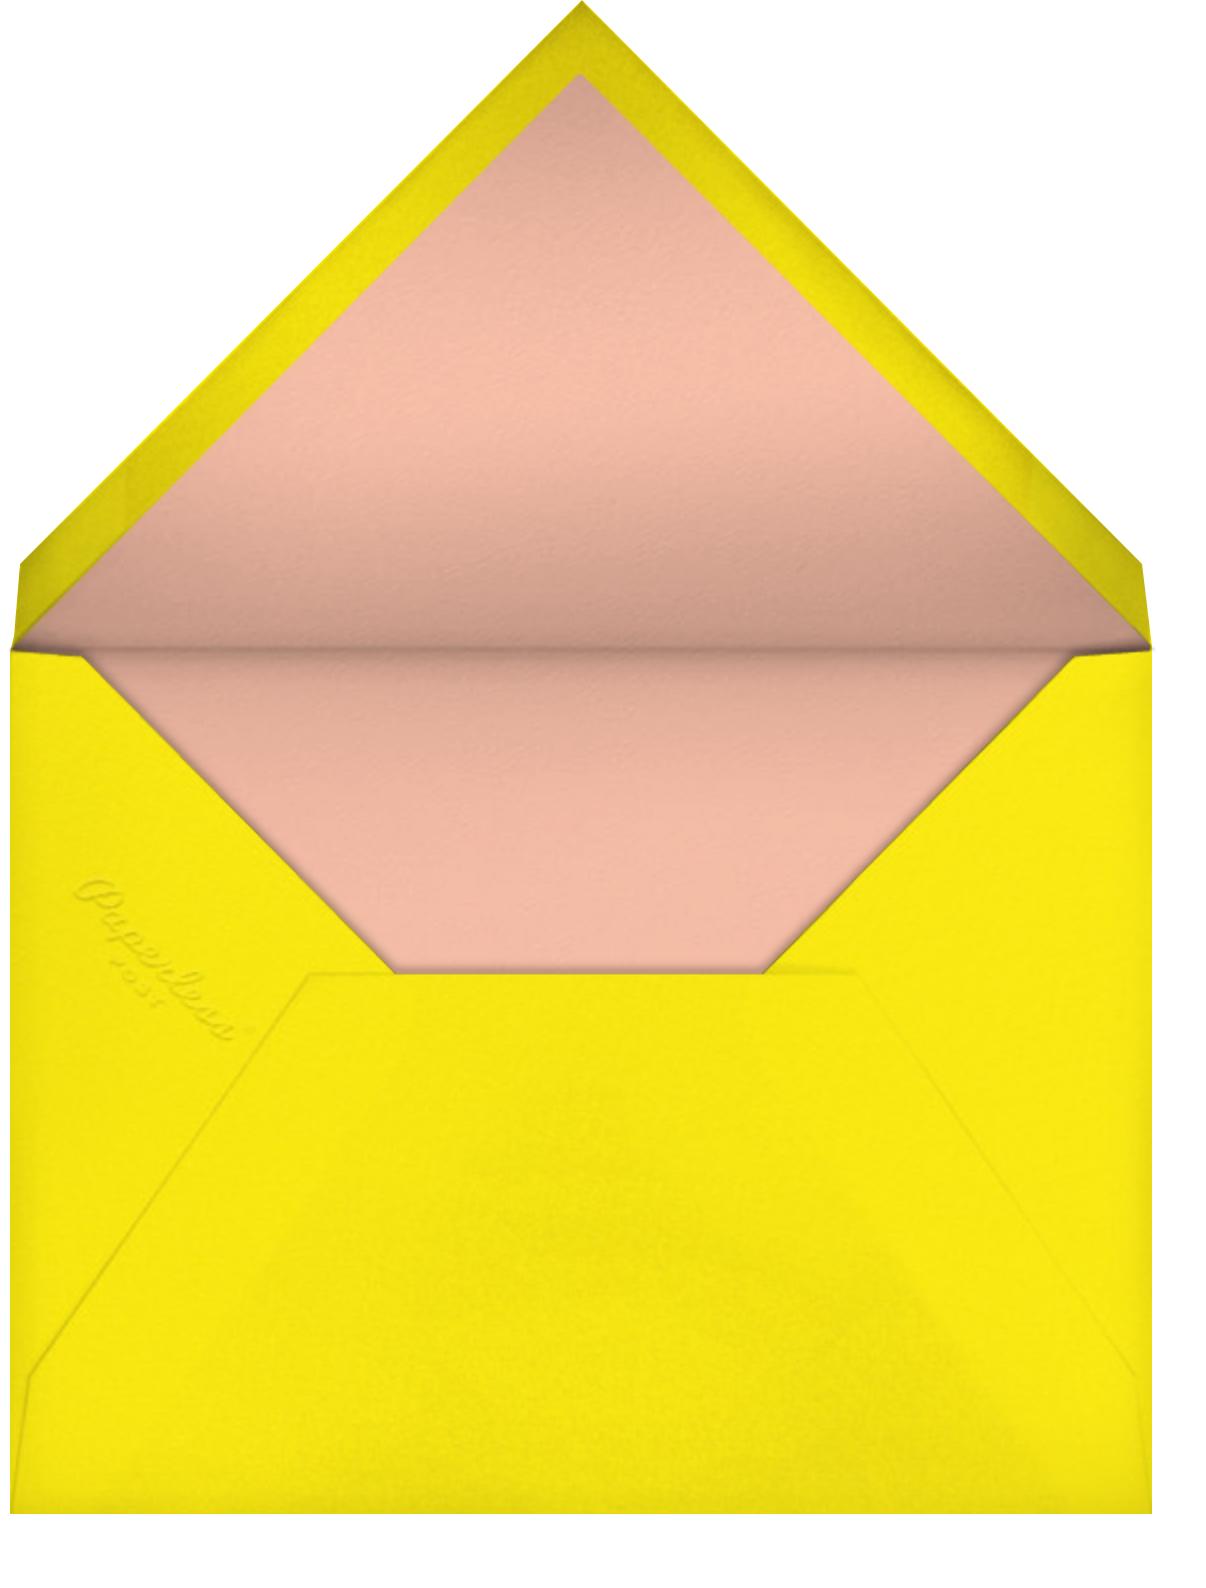 Floral Splash - Sherbet - kate spade new york - Adult birthday - envelope back